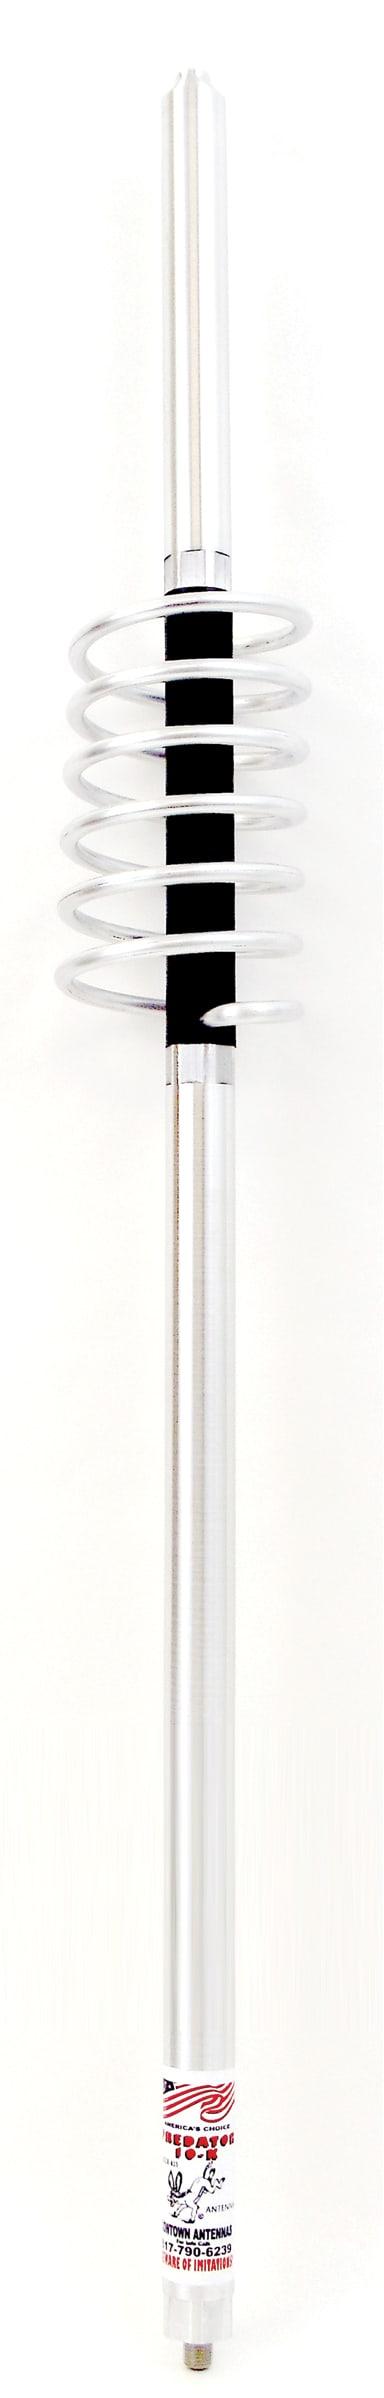 K122 - 10,000 Watt Predator Antenna